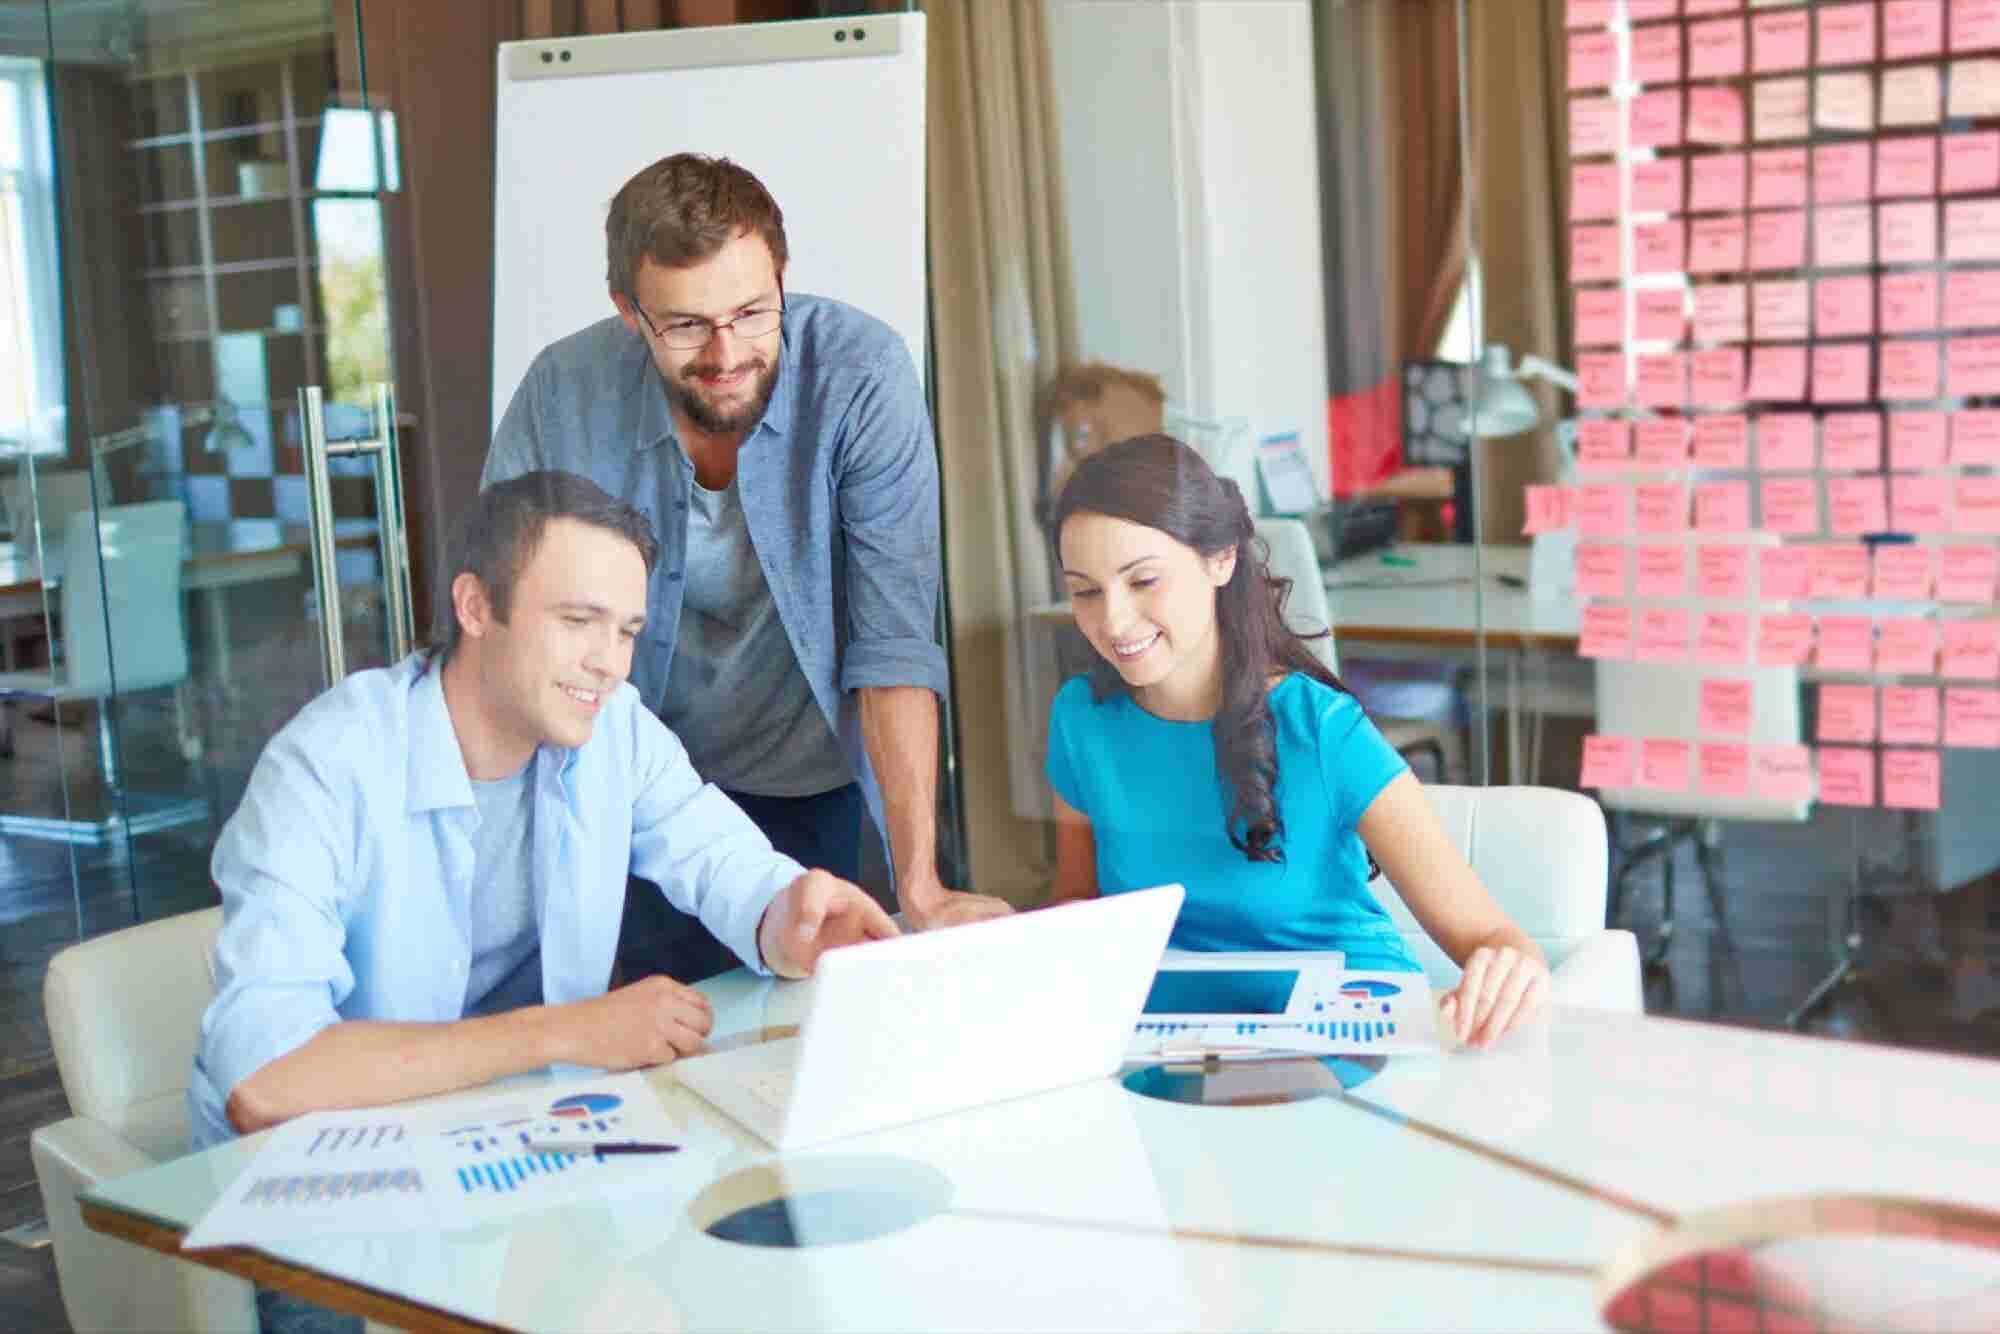 Consigue un mentor para desarrollarte como emprendedor